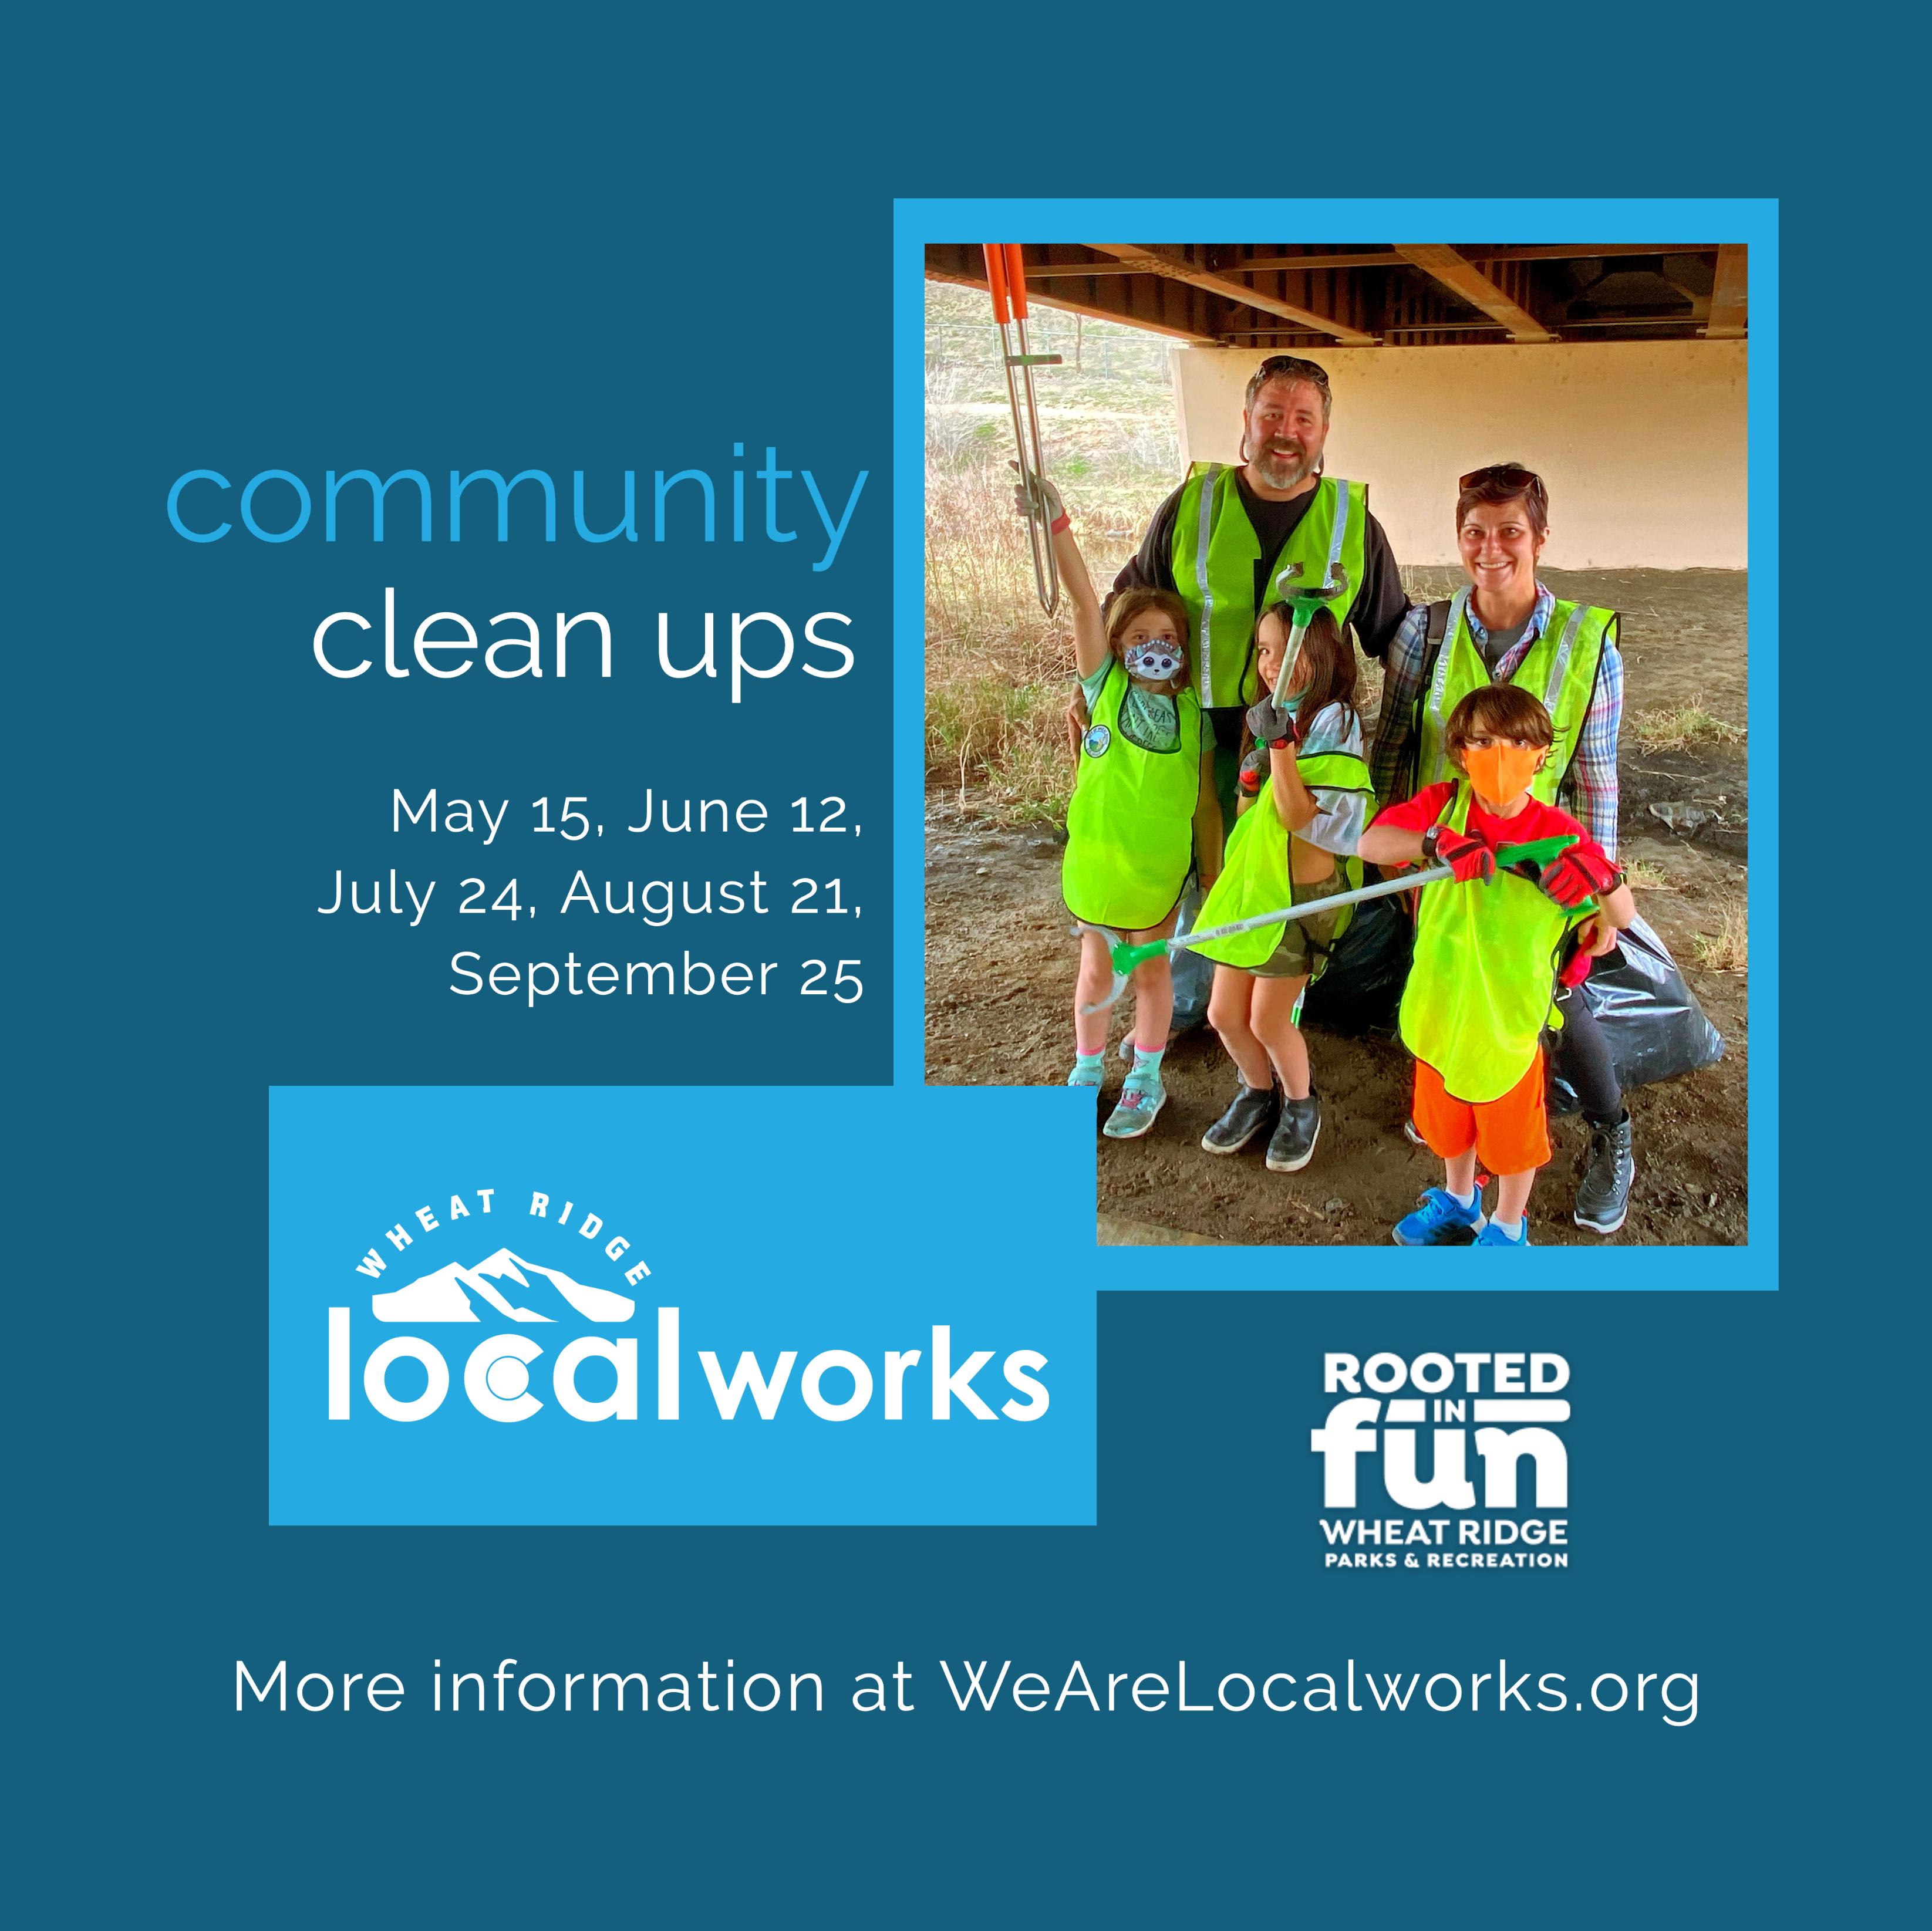 Wheat Ridge Localworks Community Clean Ups